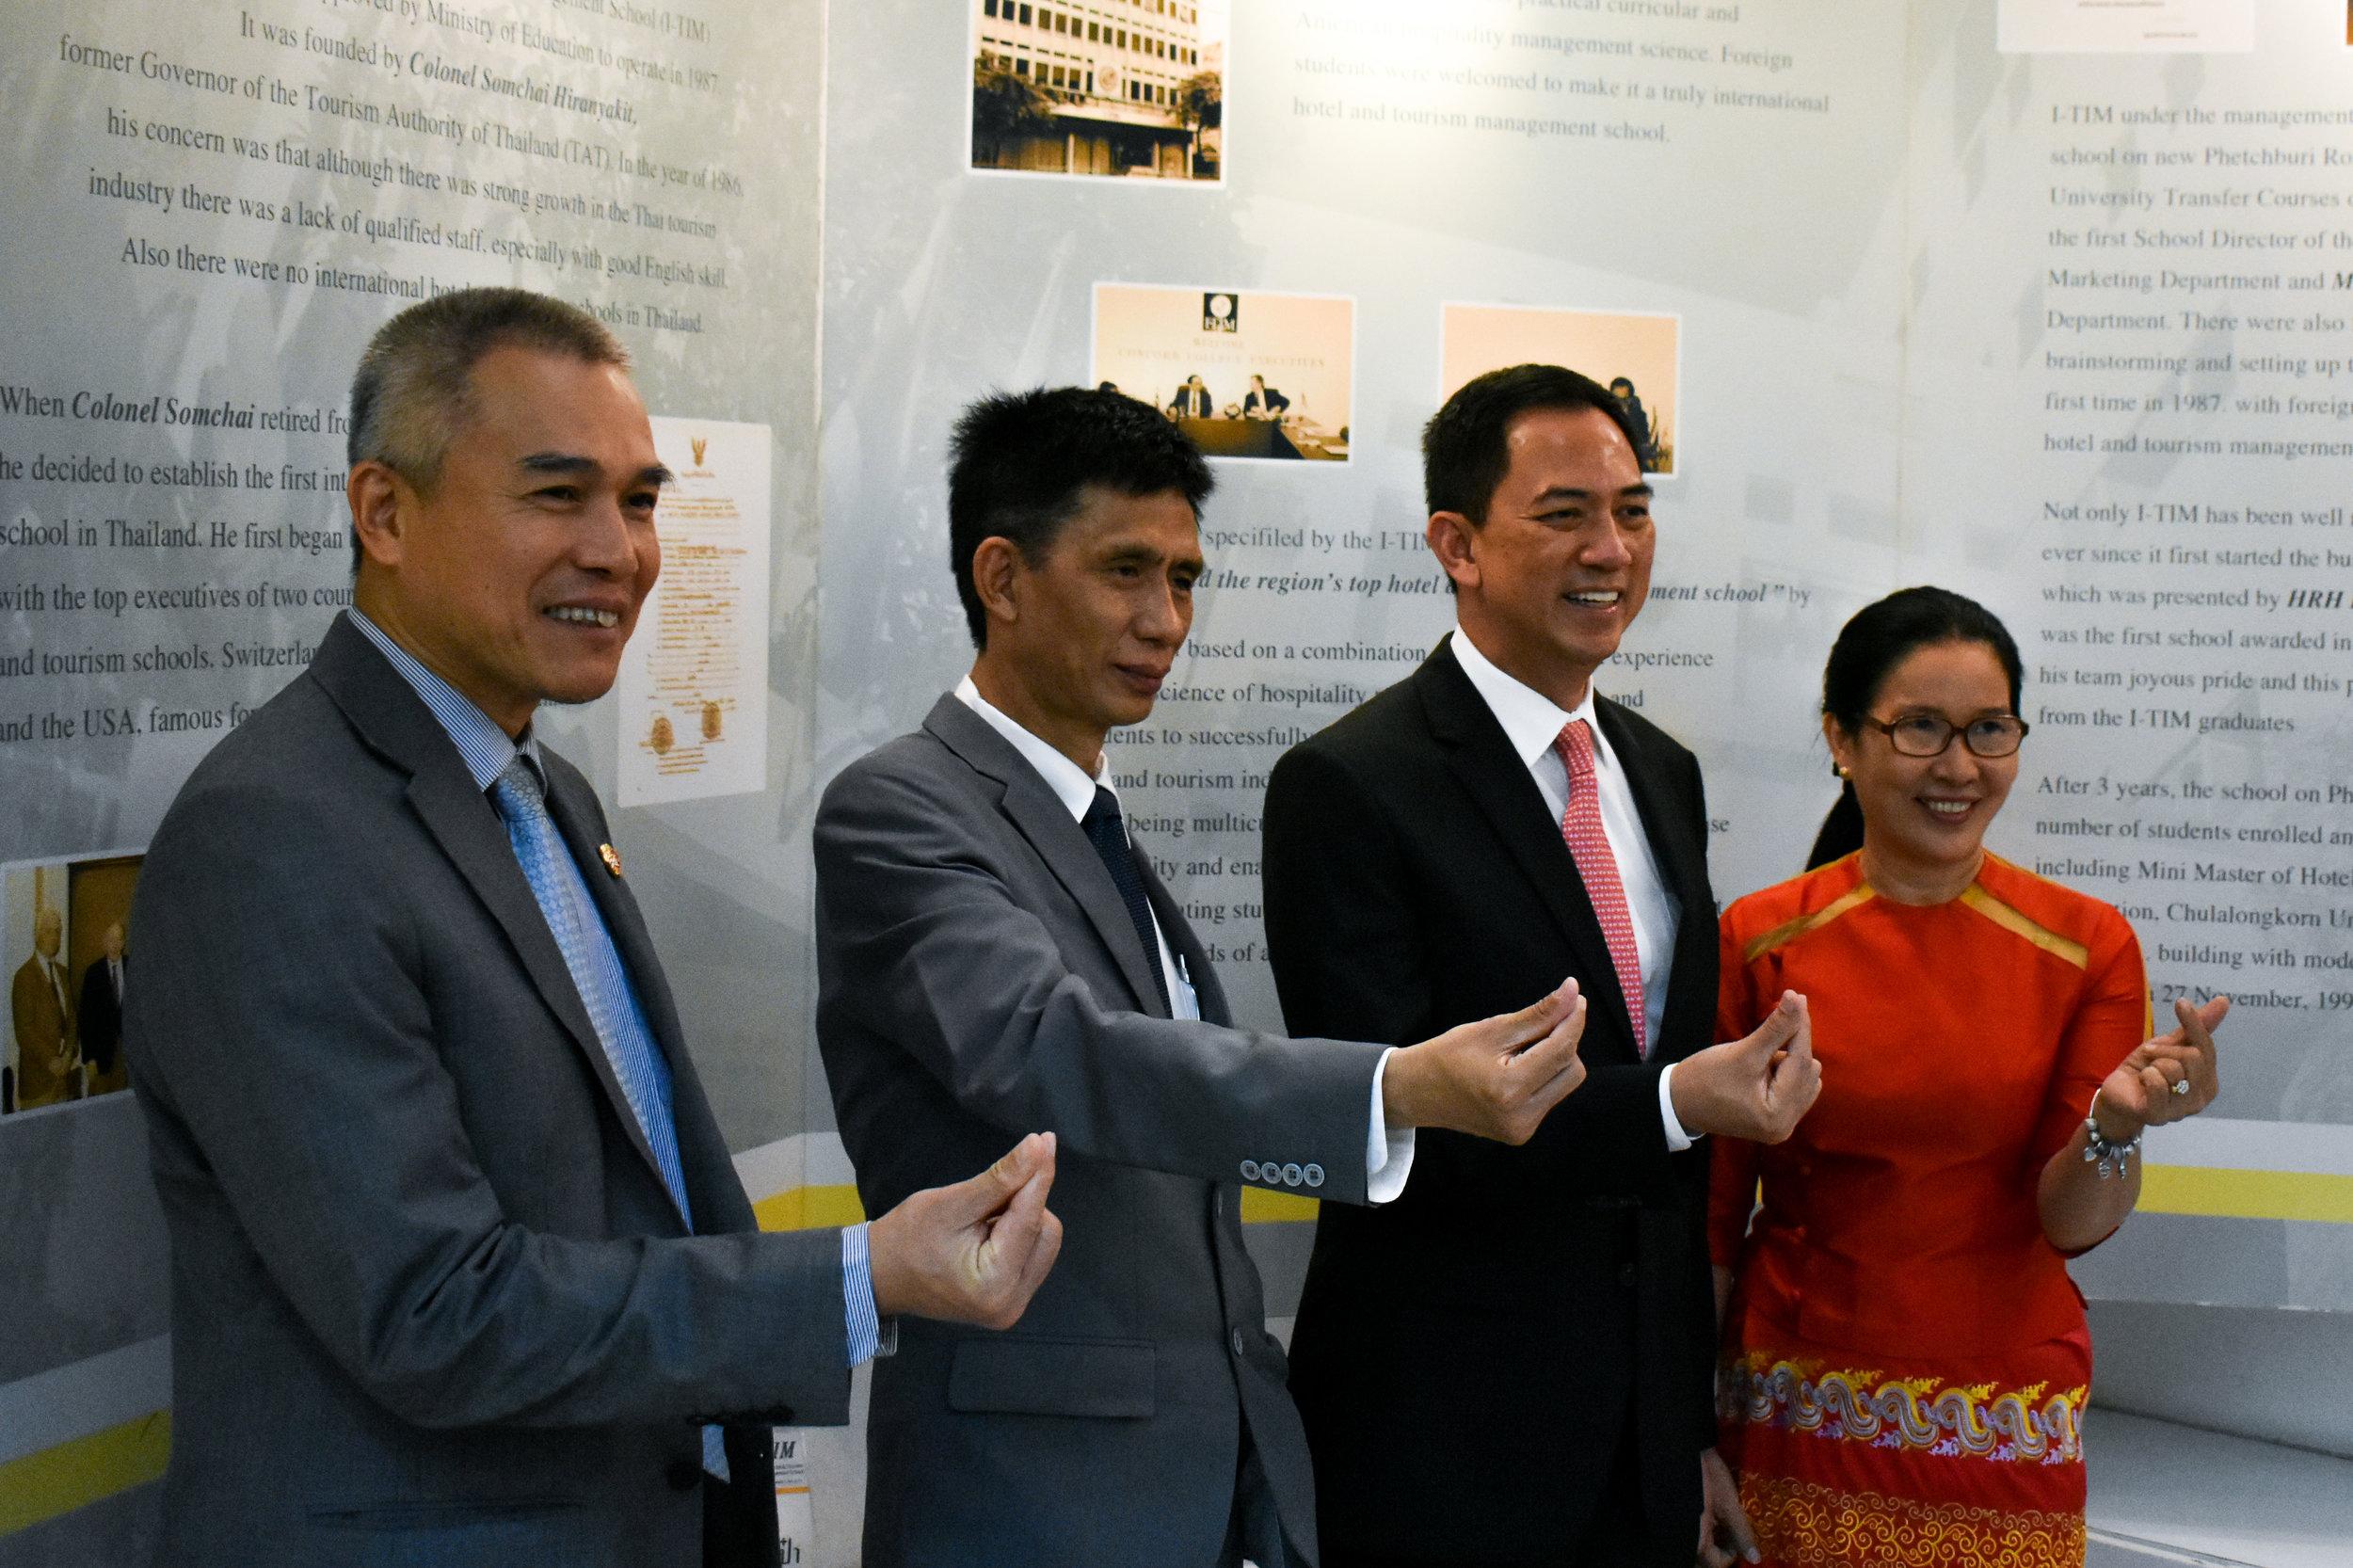 Myanmar Album 1-1 (2 of 8).jpg